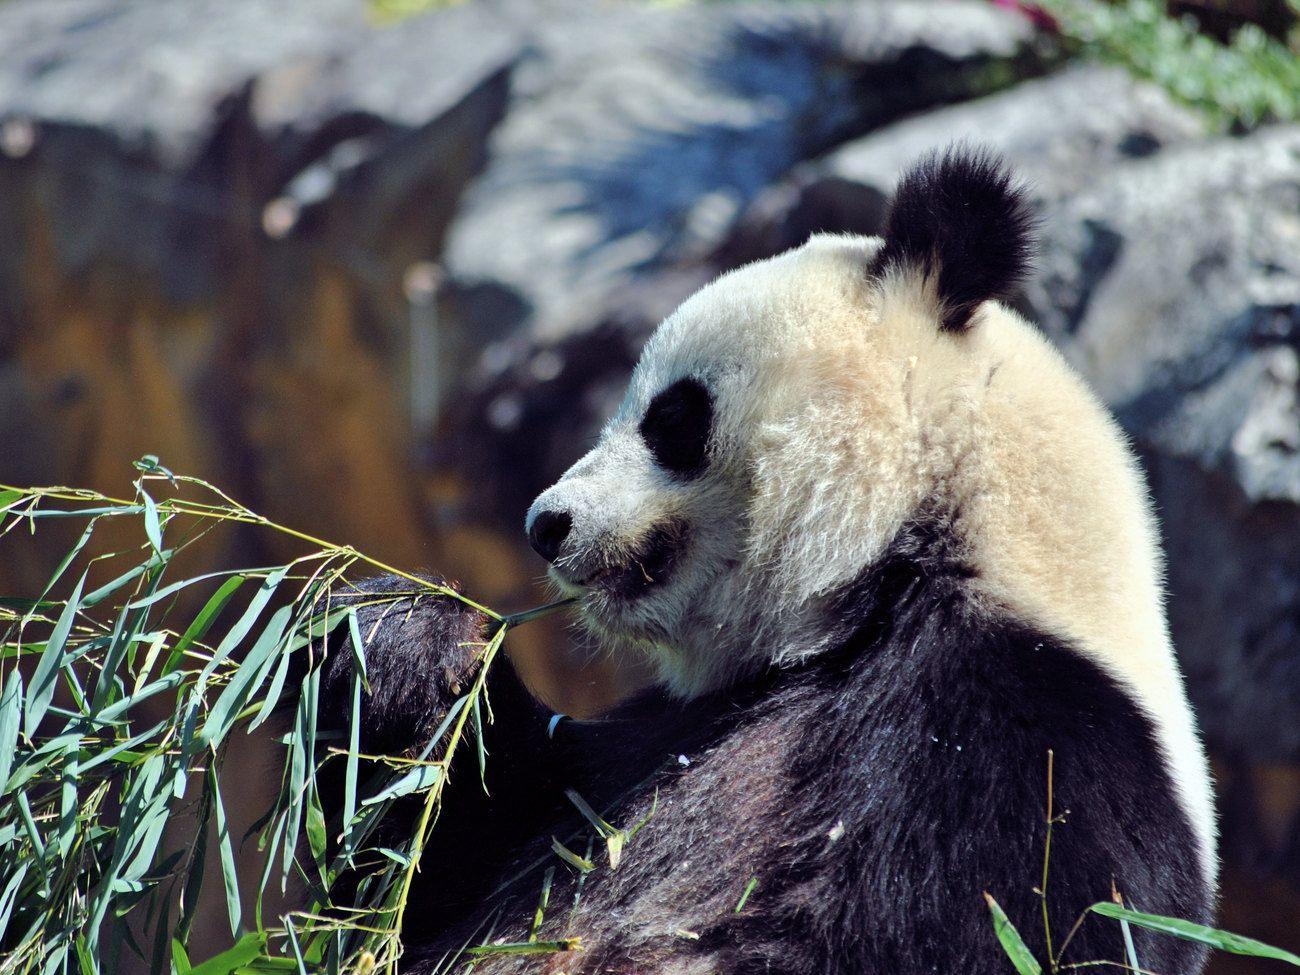 Panda géant Giant Panda 4 by kordouane Share your